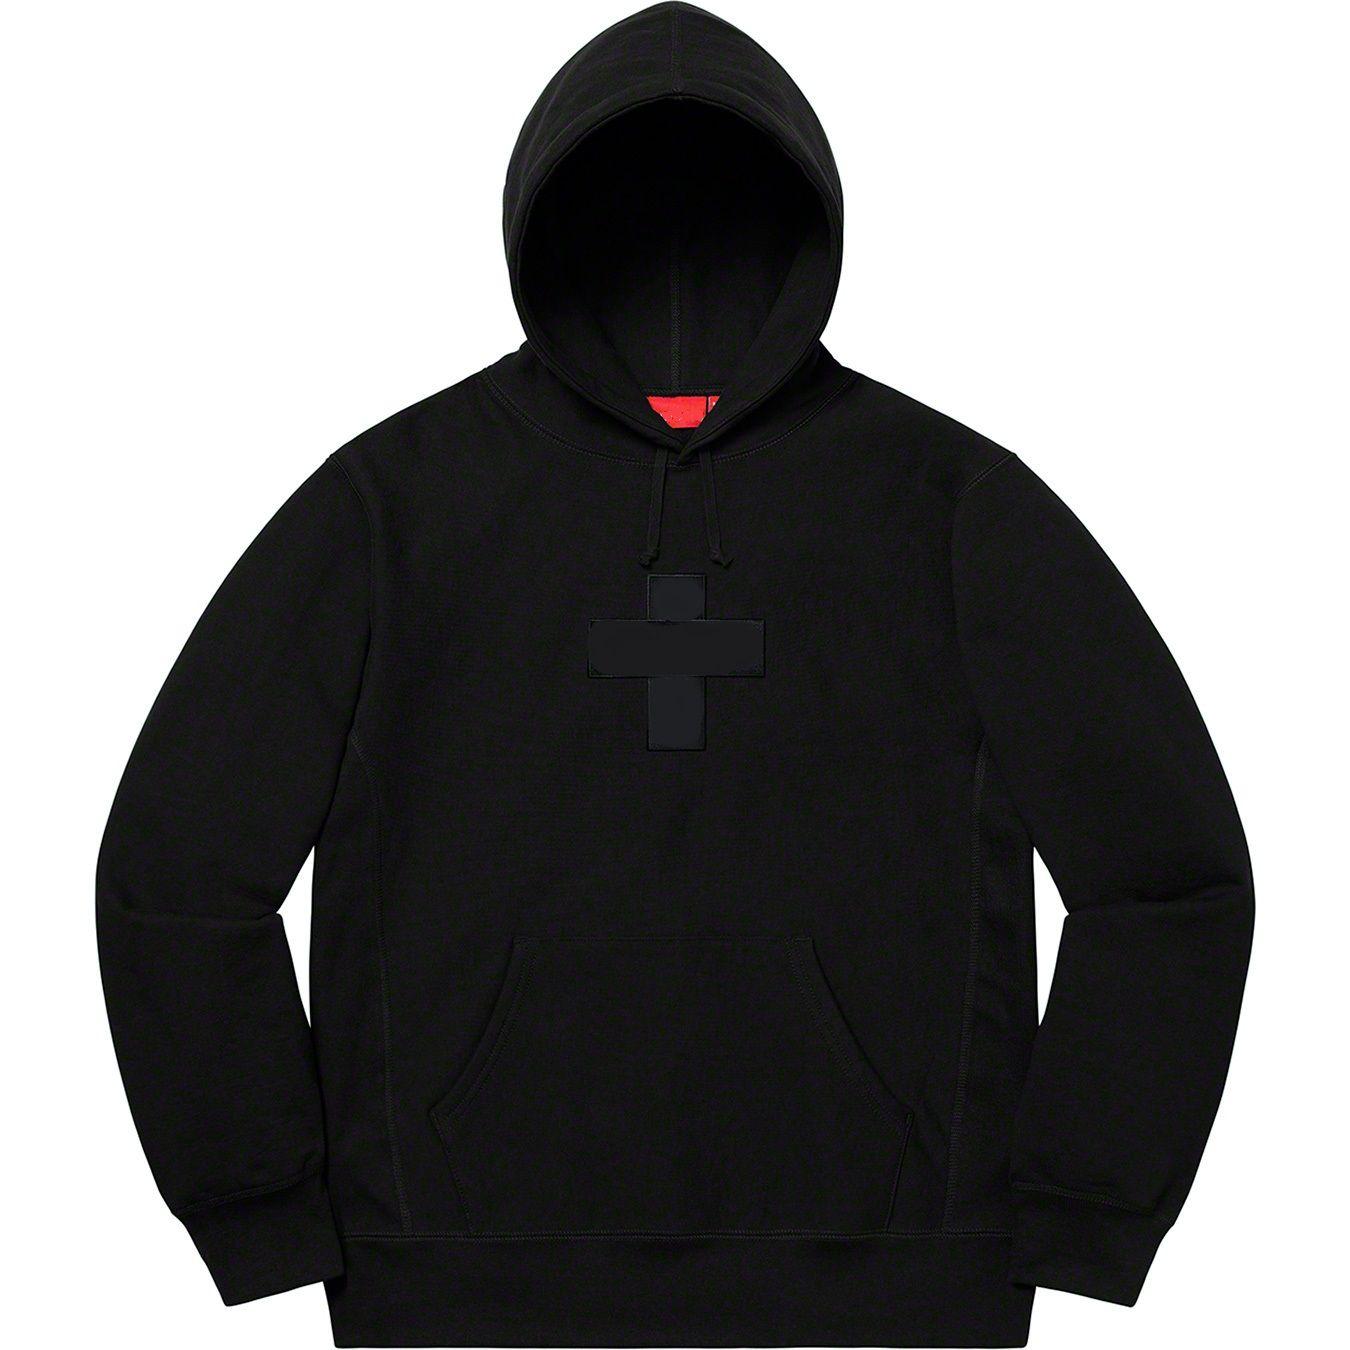 2021 USA Mens Womens Street Hood Hip Hop Sweatshirts 클래식 크로스 편지 자수 EUR 크기 가을 후드